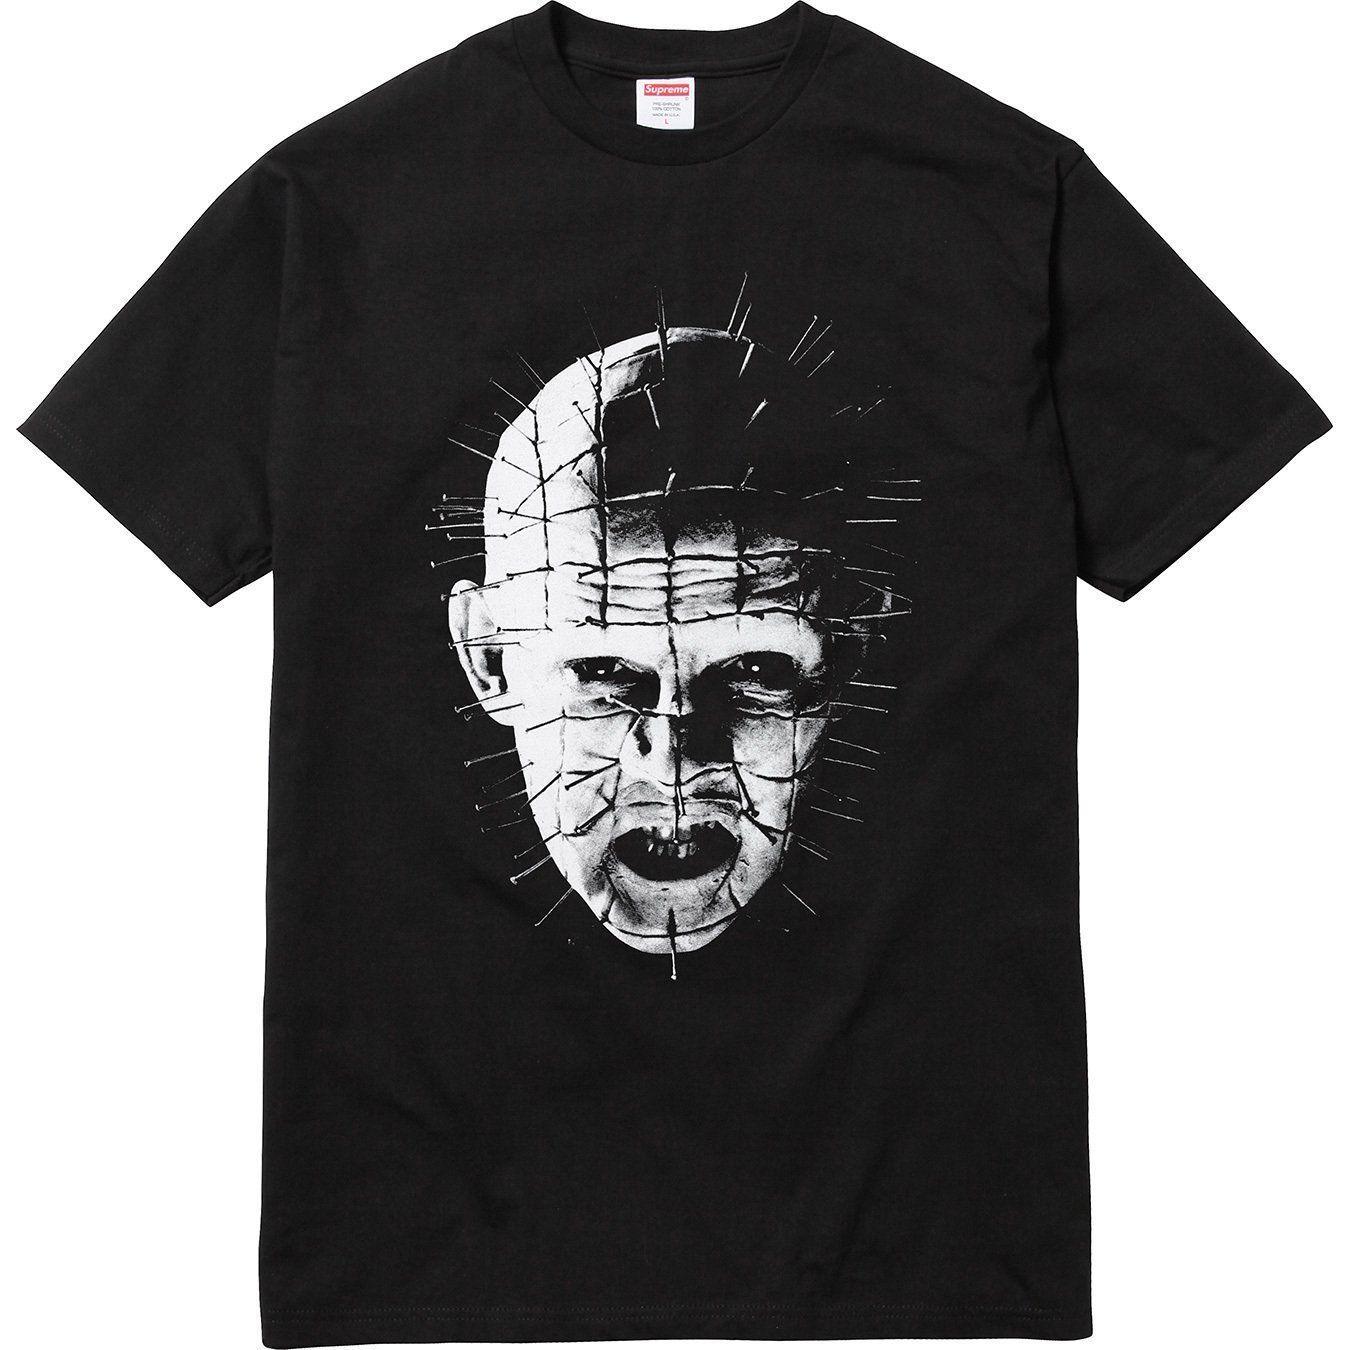 da88ac002 Men O Neck High Quality Hot Sell Hellraiser Pinhead Tee SS18 Black Medium  Really Funny T Shirts Funny Vintage T Shirts From Onecktshirt, $11.17|  DHgate.Com